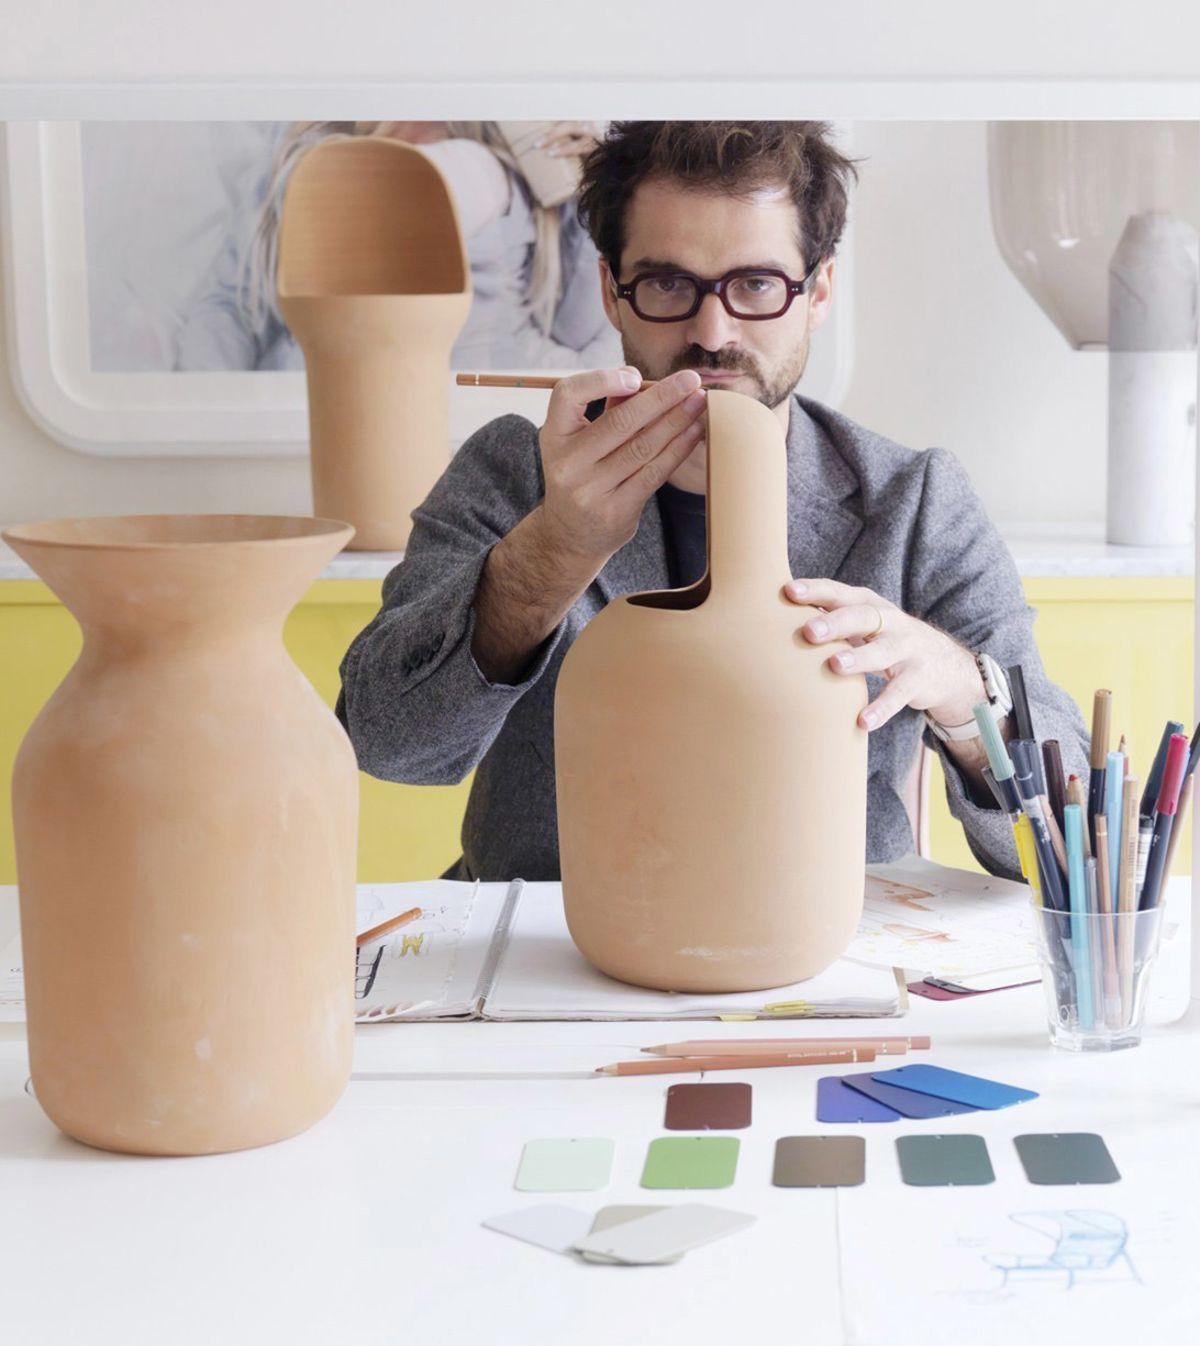 Il designer Jaime Haydon